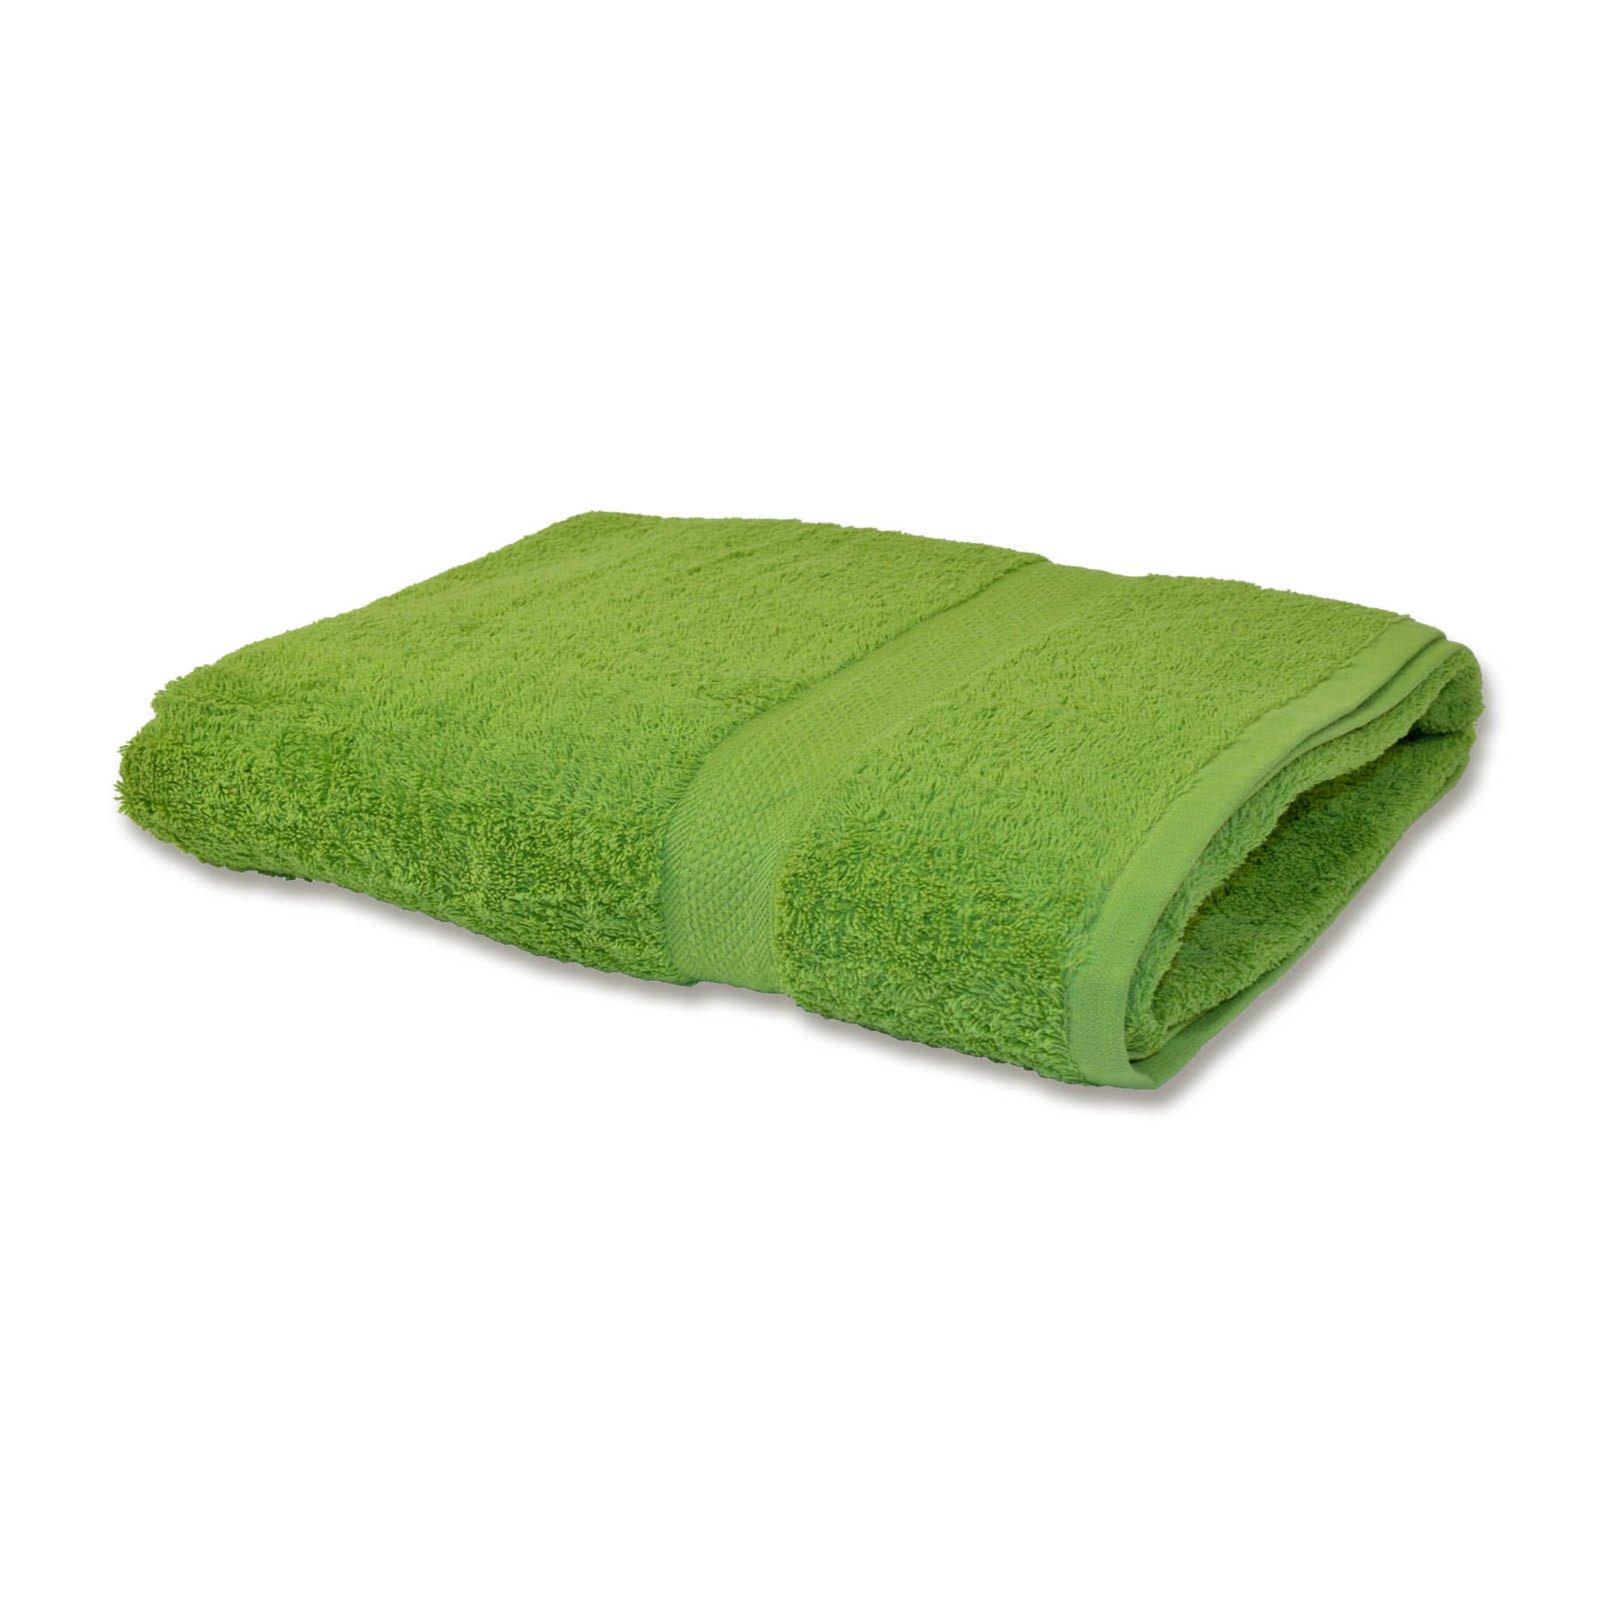 handtuch premium baumwolle gr n 50x100 cm handt cher badtextilien bad accessoires. Black Bedroom Furniture Sets. Home Design Ideas